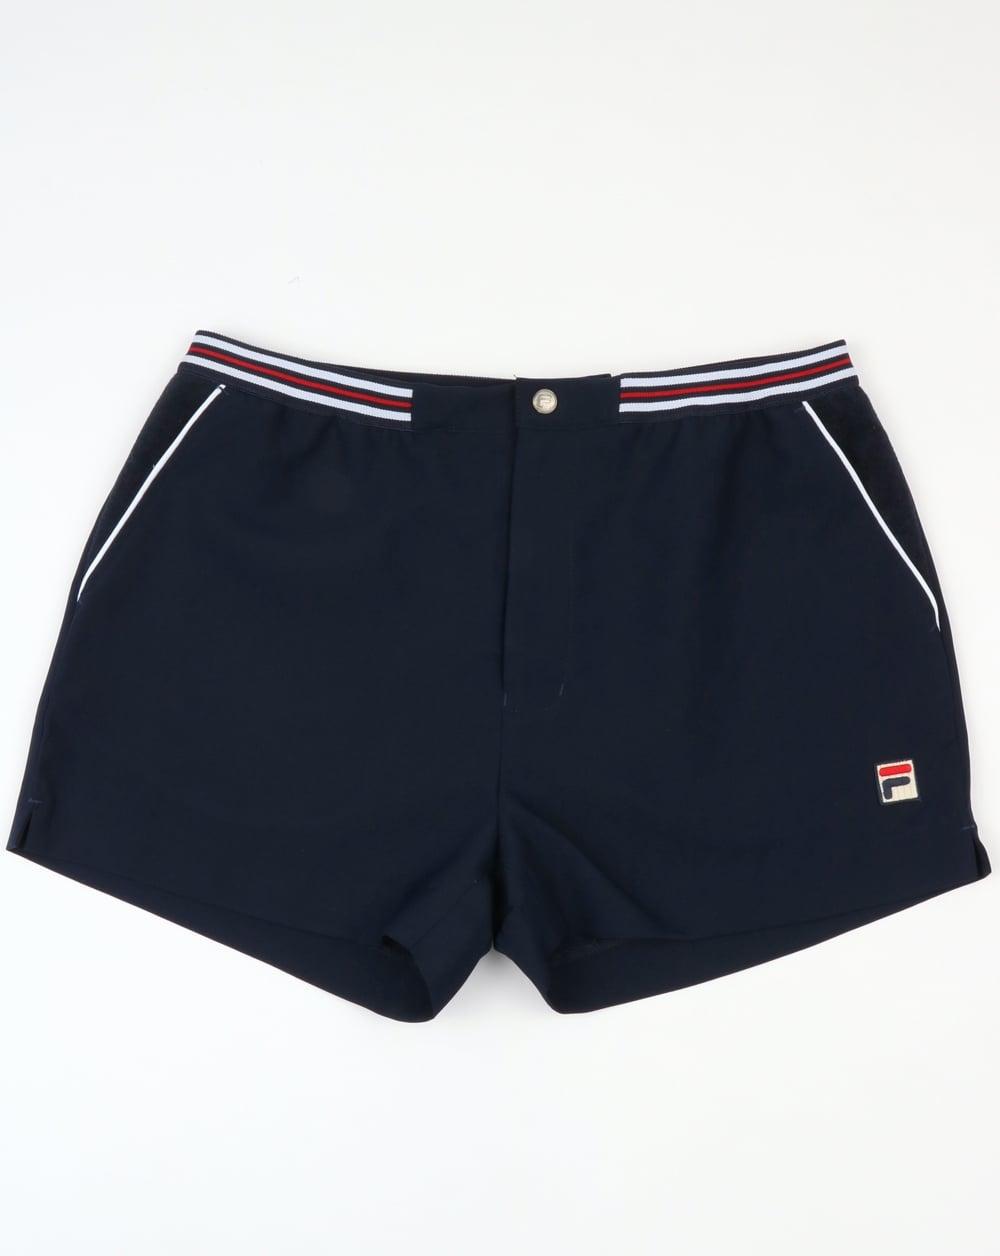 ee9c1ea7f80c vintage lacoste shorts sale   OFF38% Discounts